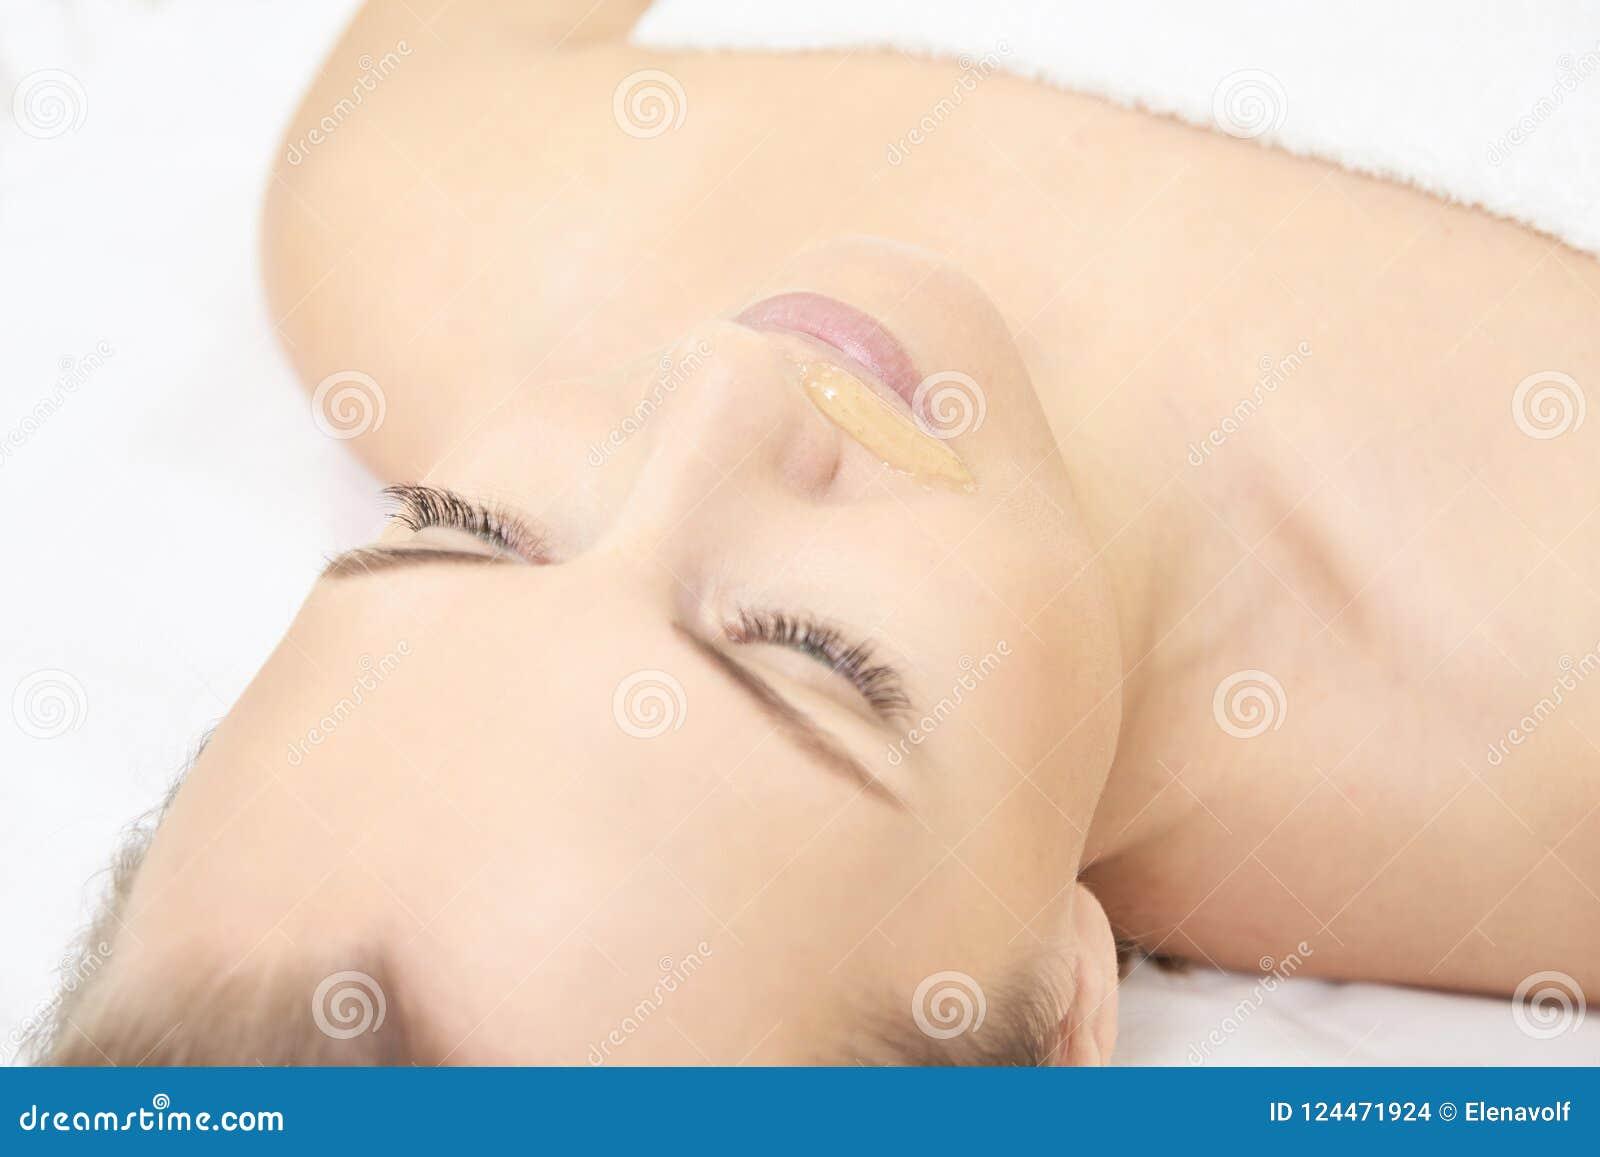 Waxing woman leg. Sugar hair removal. laser service epilation. Salon wax beautician procedure